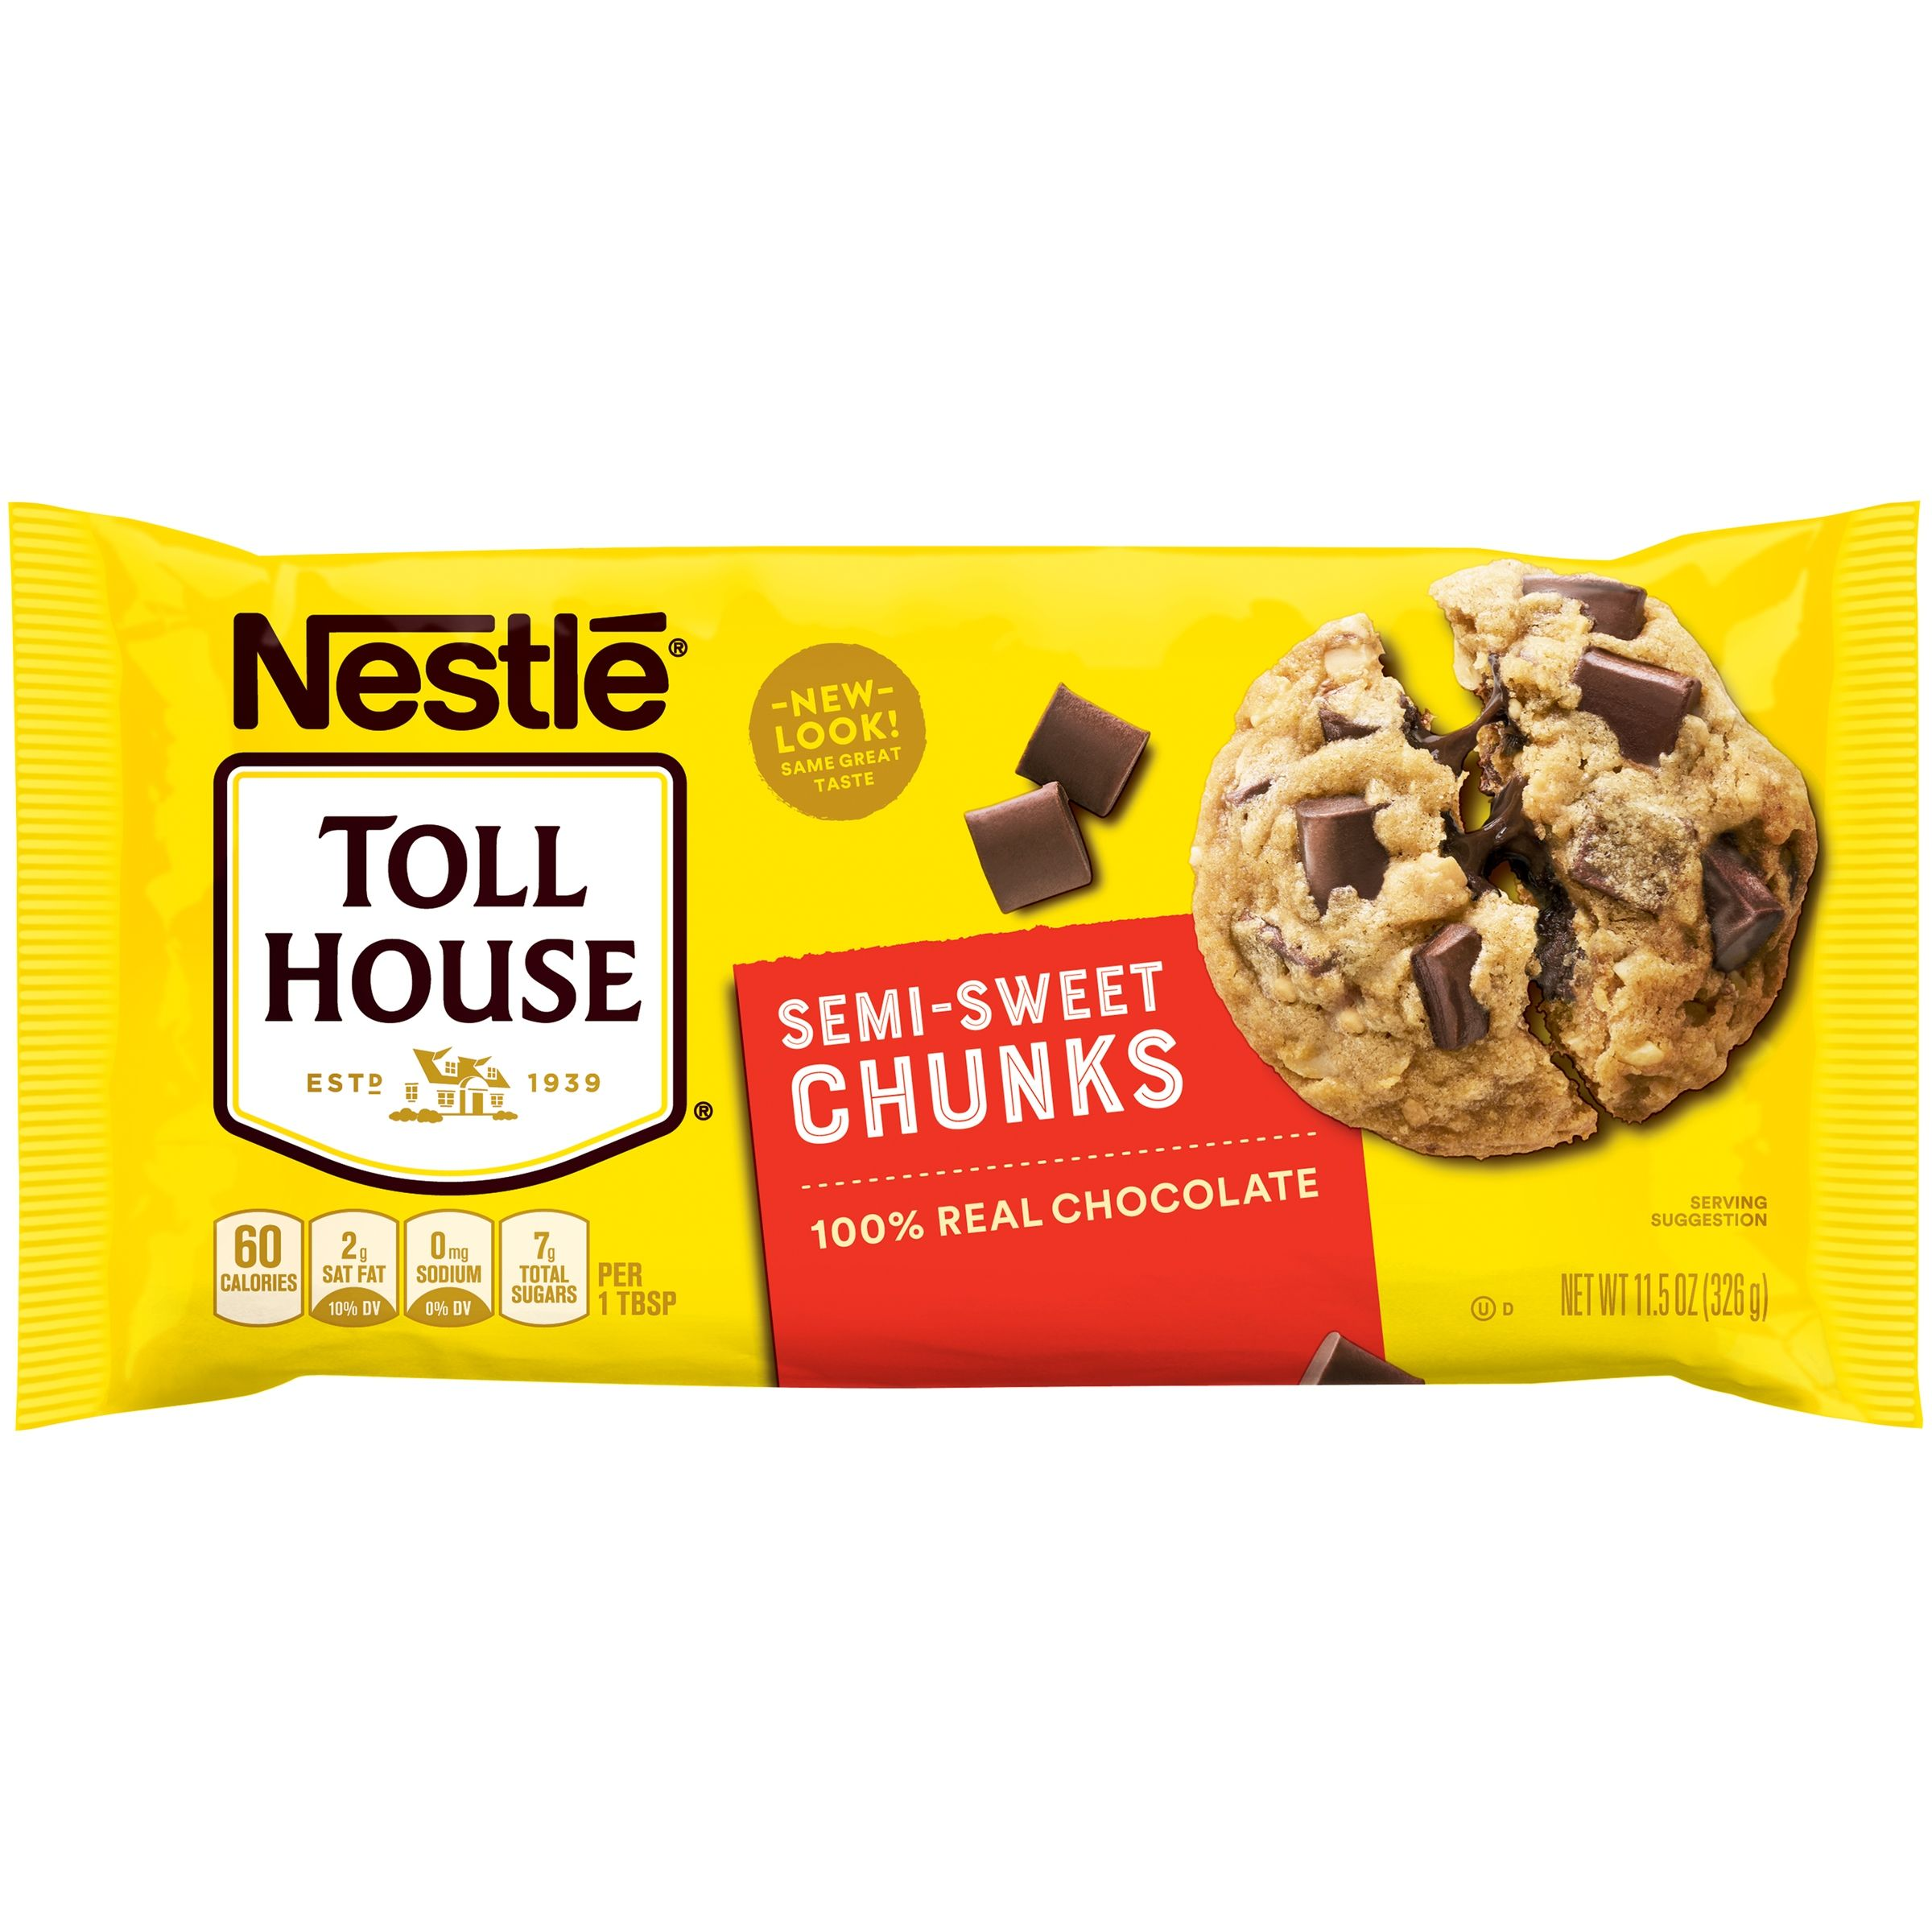 Nestle Toll House Semi Sweet Chocolate Chunks 11 5 Oz Walmart Com Toll House Chocolate Chip Nestle Toll House Toll House